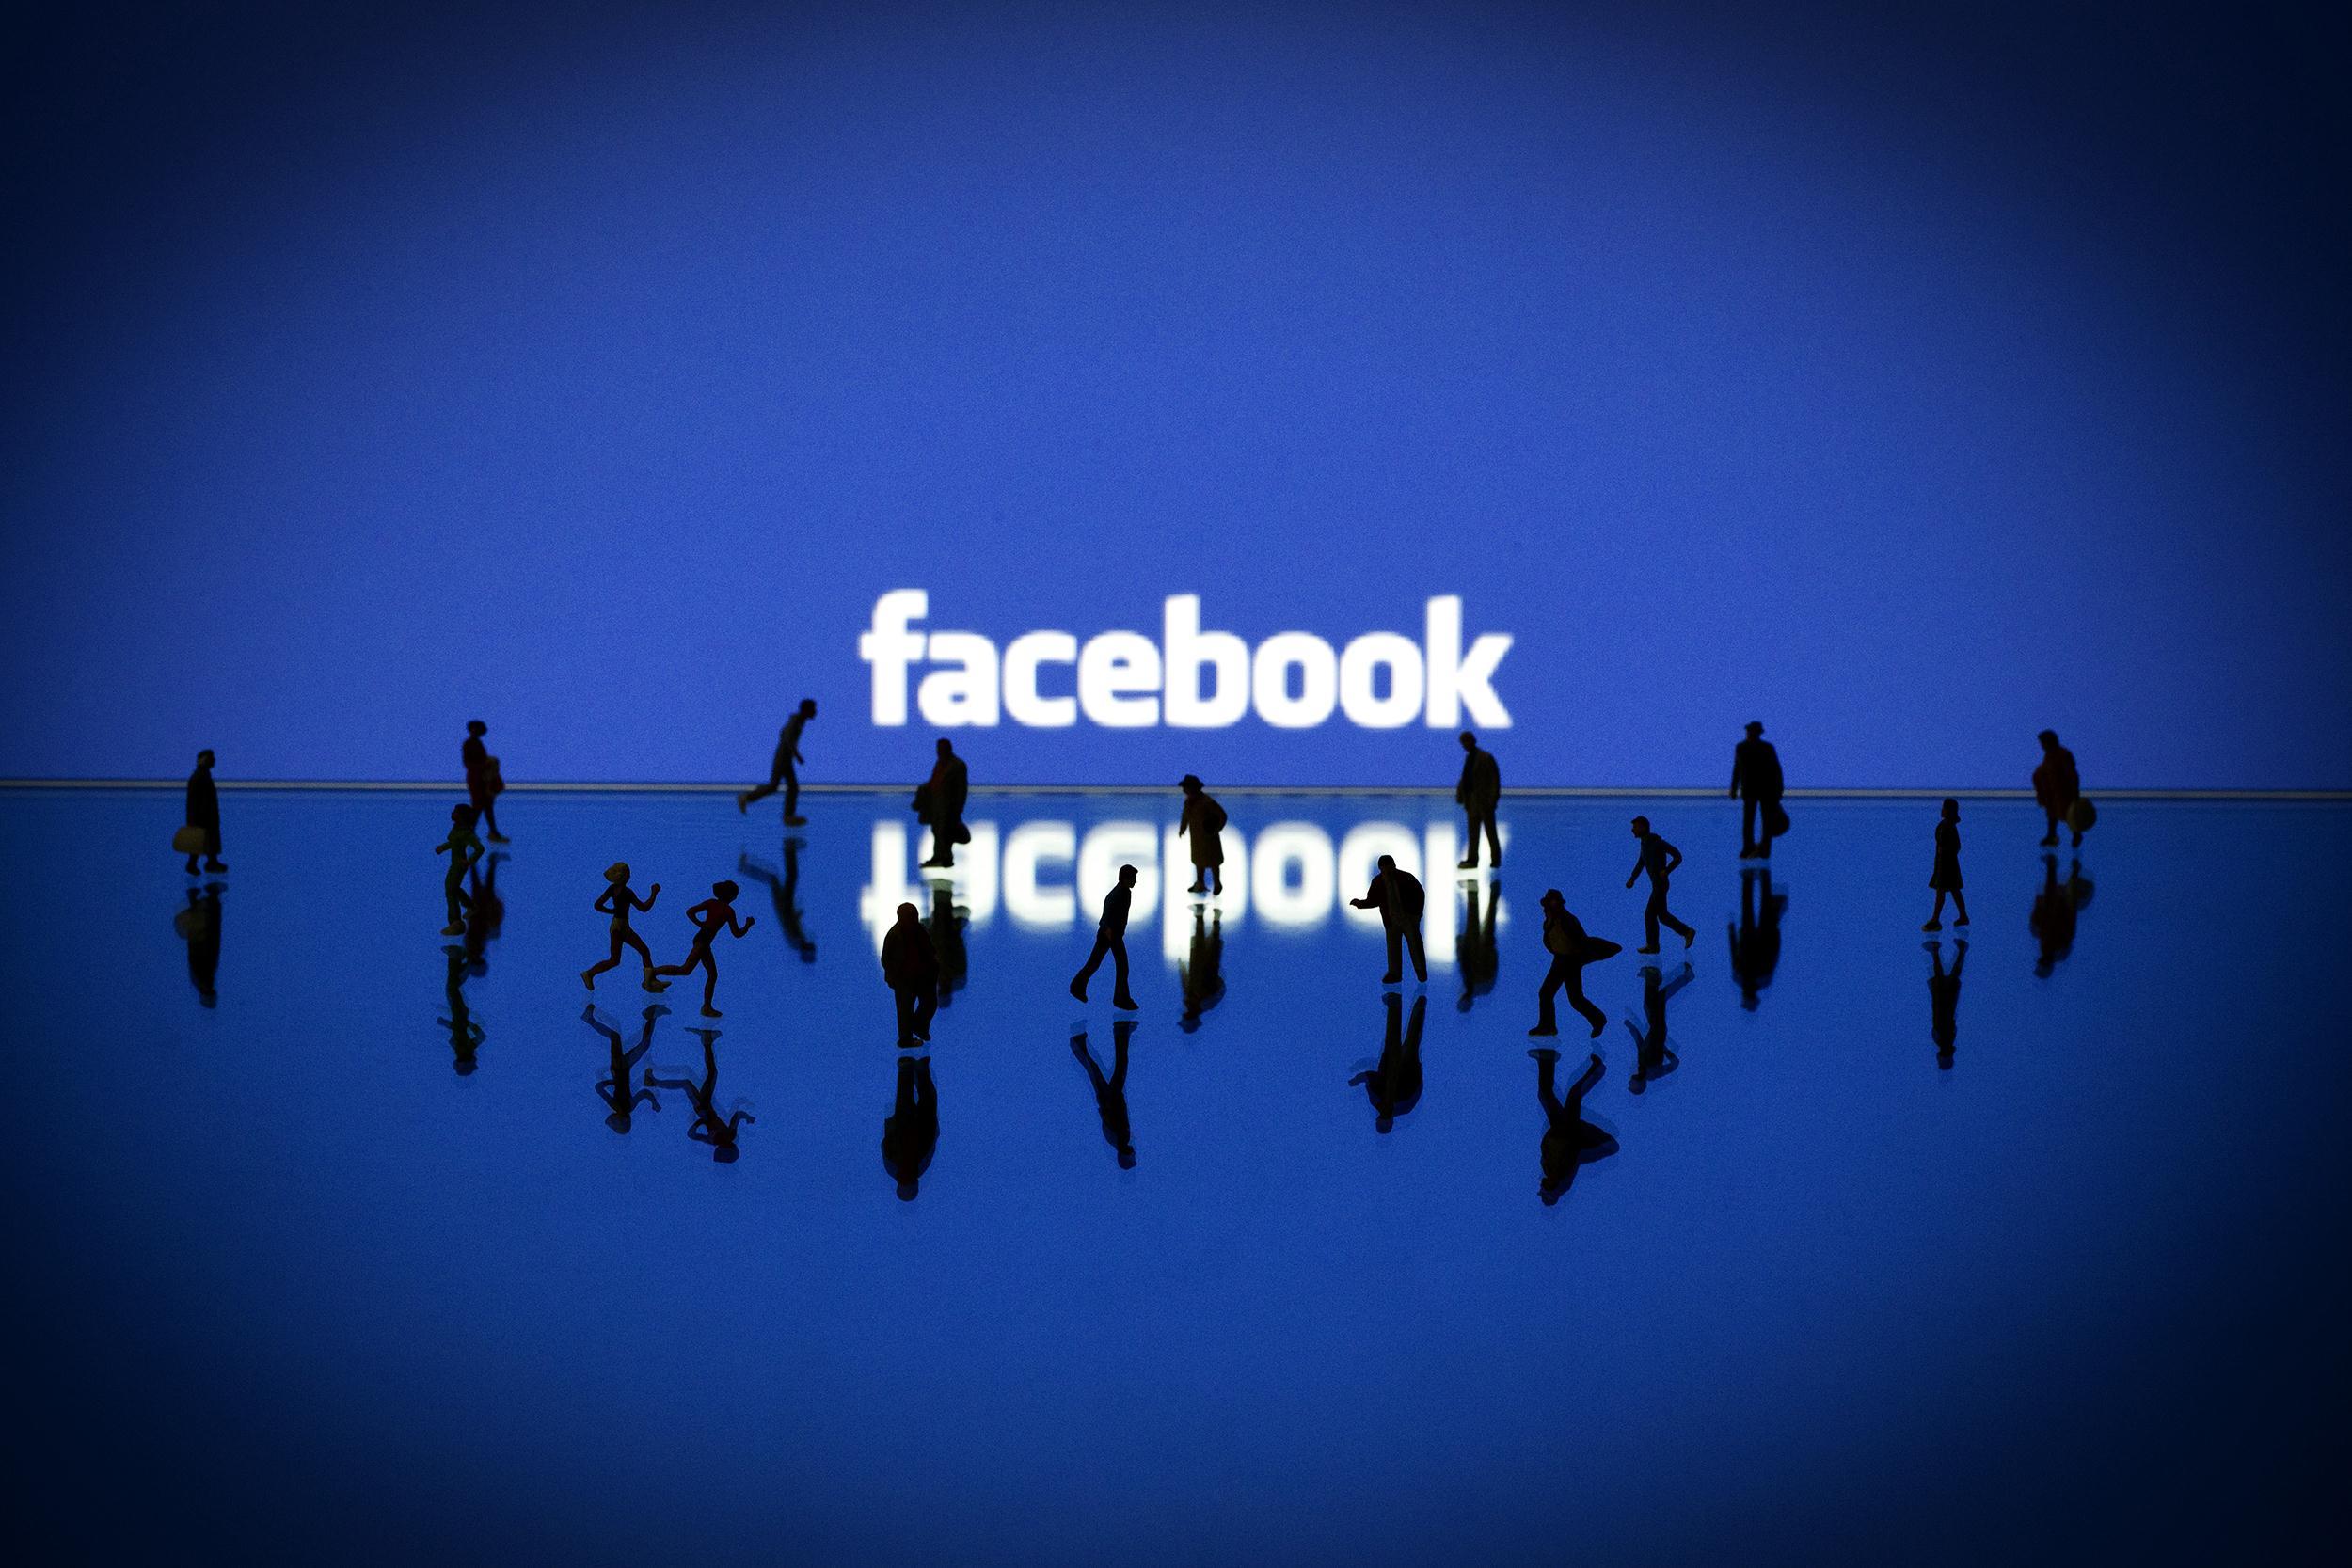 -facebook-emotions-1749_4f881e85b96bea3a796ae8d7e0ab44c4